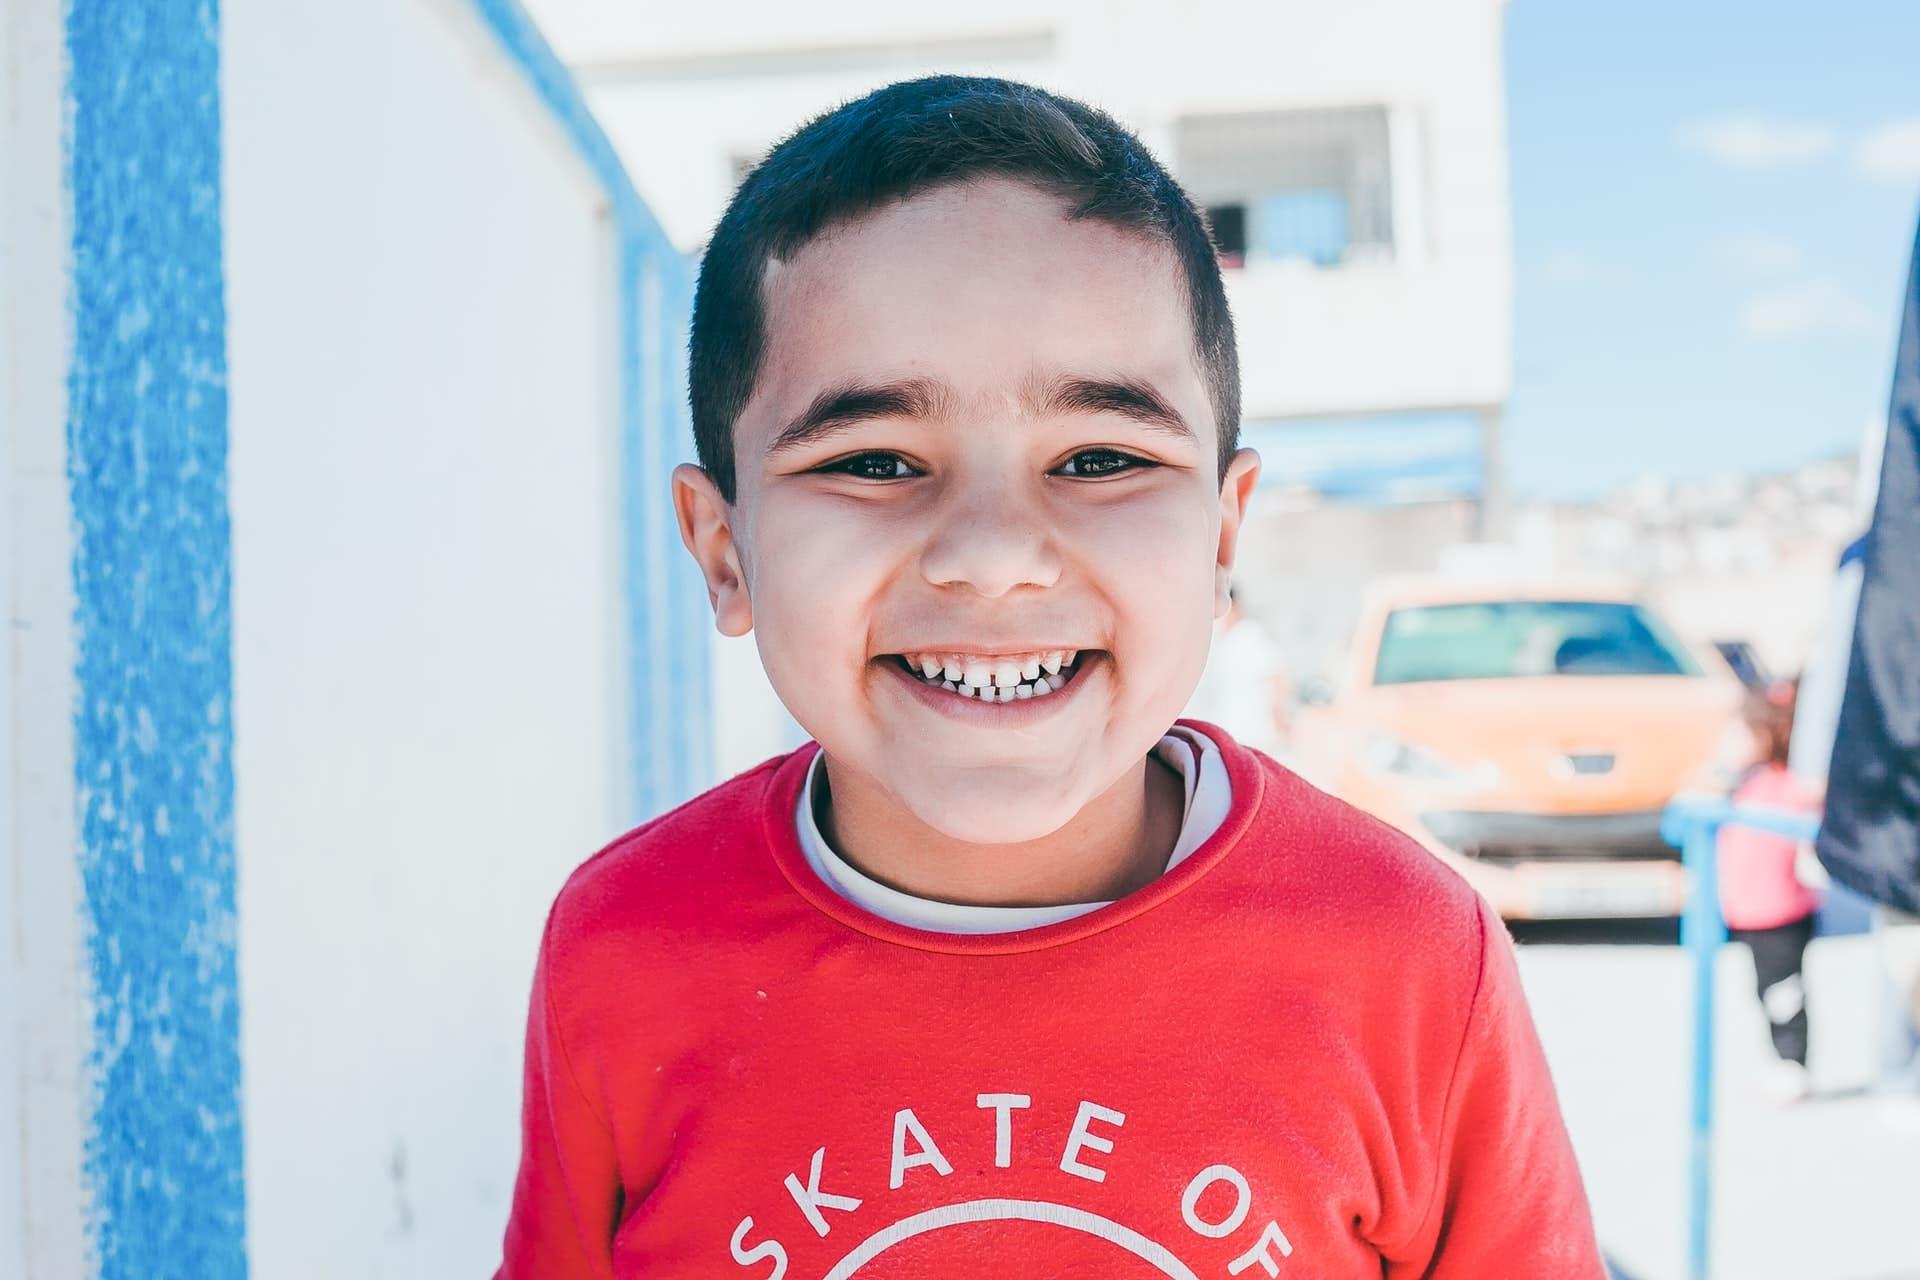 abdelkader ft jvenLZD1M4I unsplash - When Do Kids Lose Teeth?